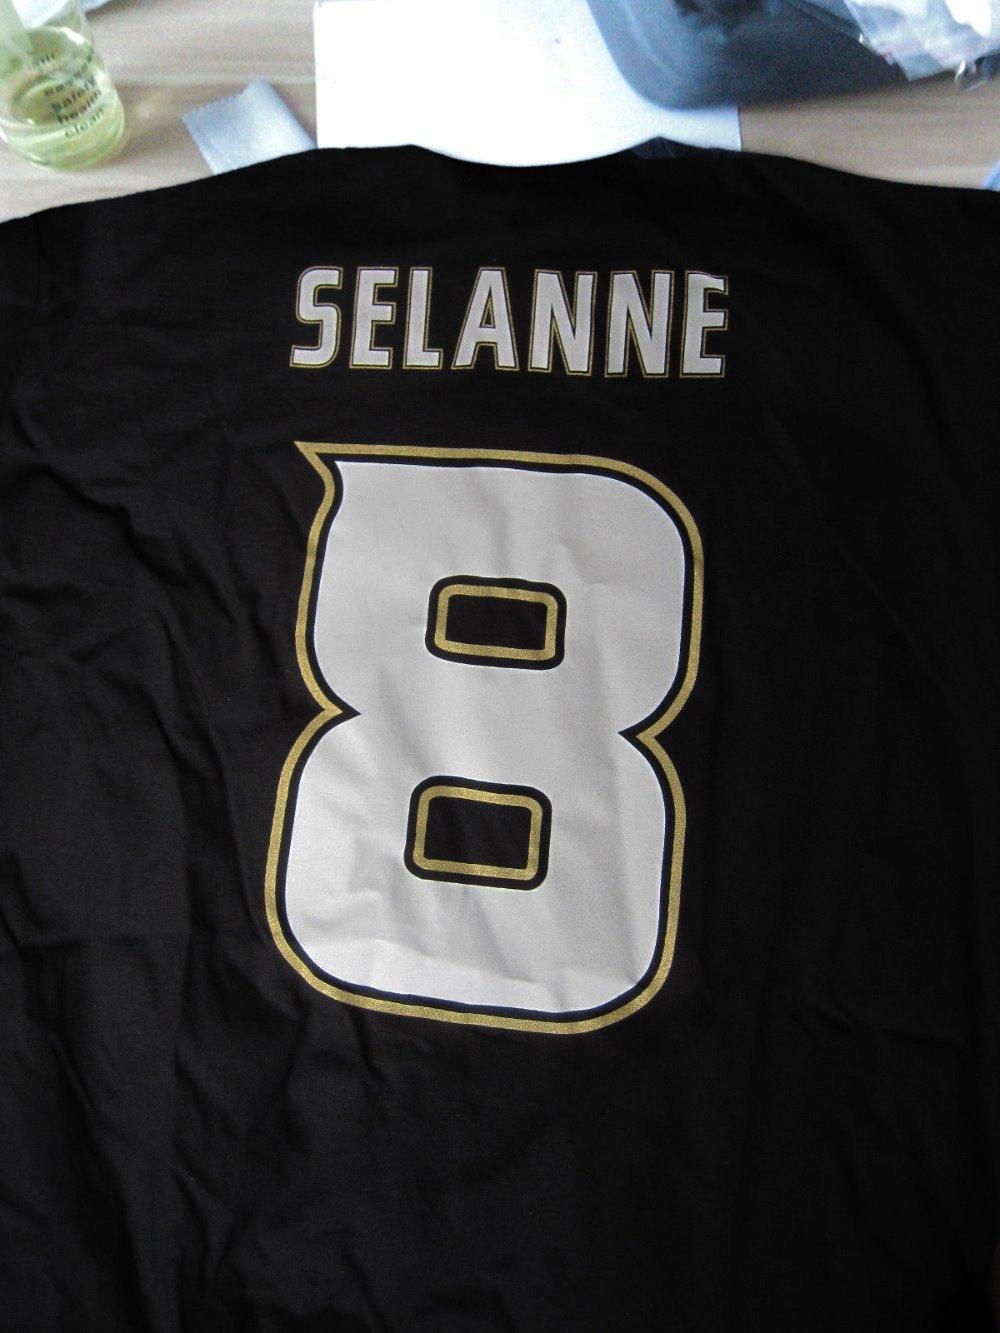 Design t shirt gildan -  New Design Gildan T Shirt Teemus Selanne Hockey Finnish Flash Personized Design Custom Name Number